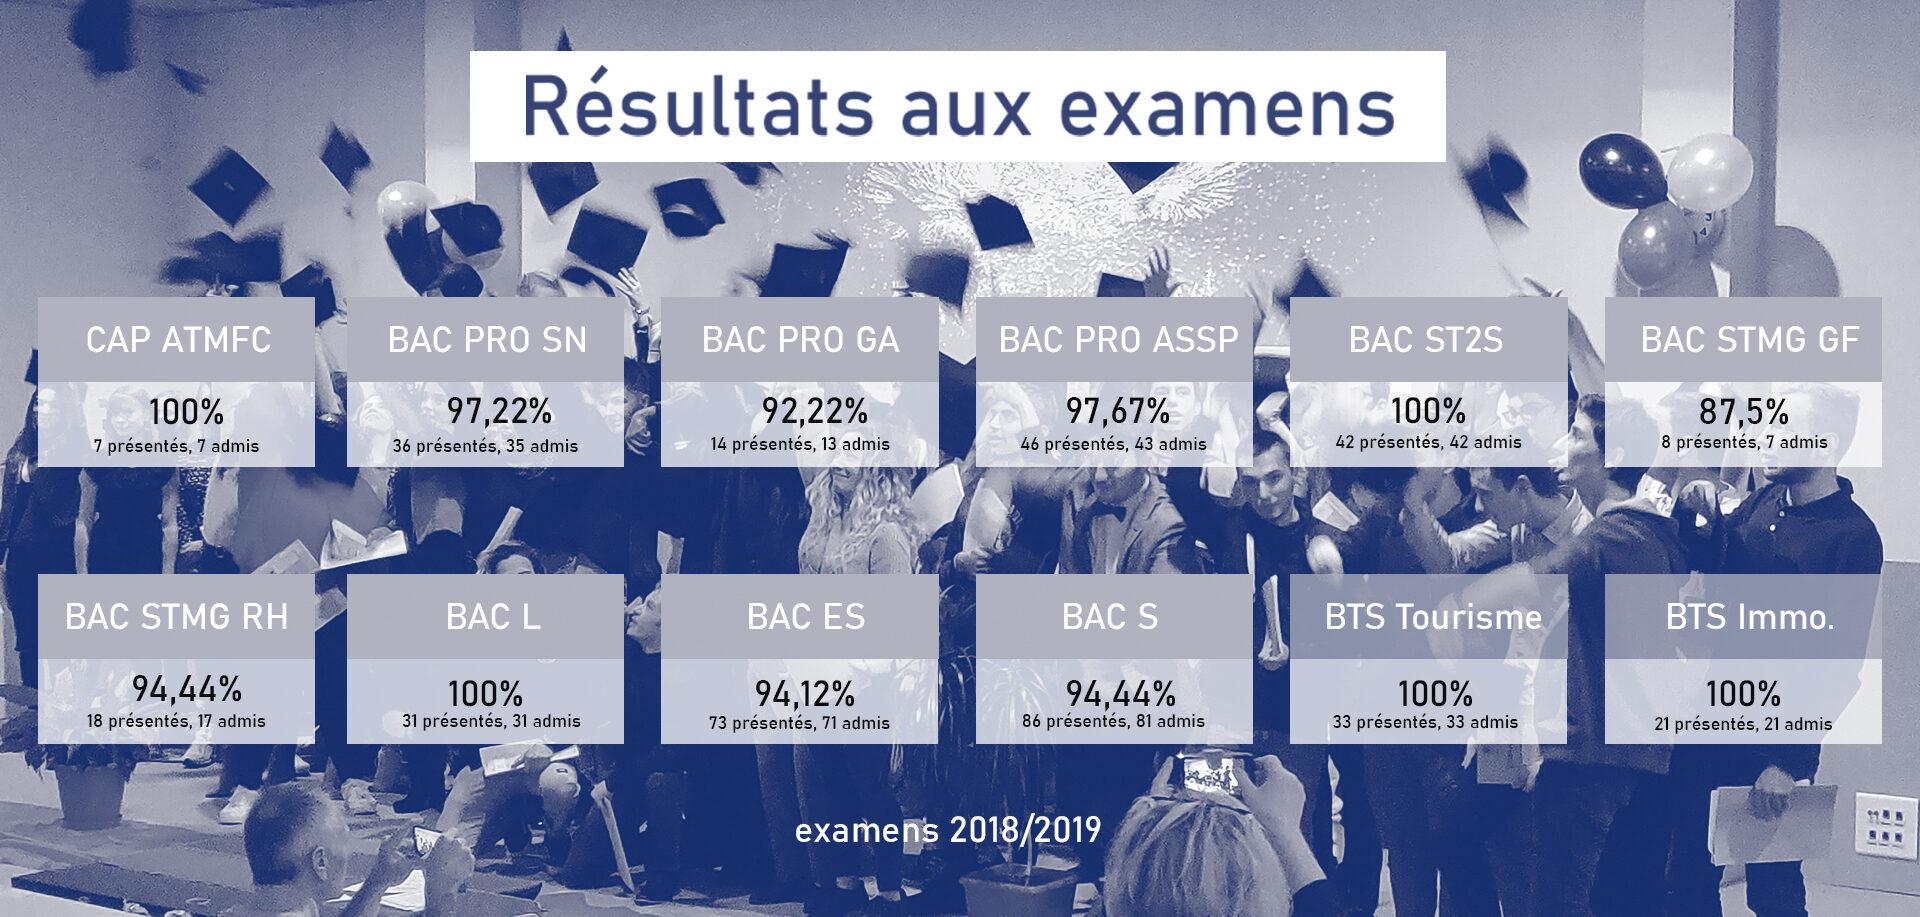 Lycée SMP - Résultats examens 2019